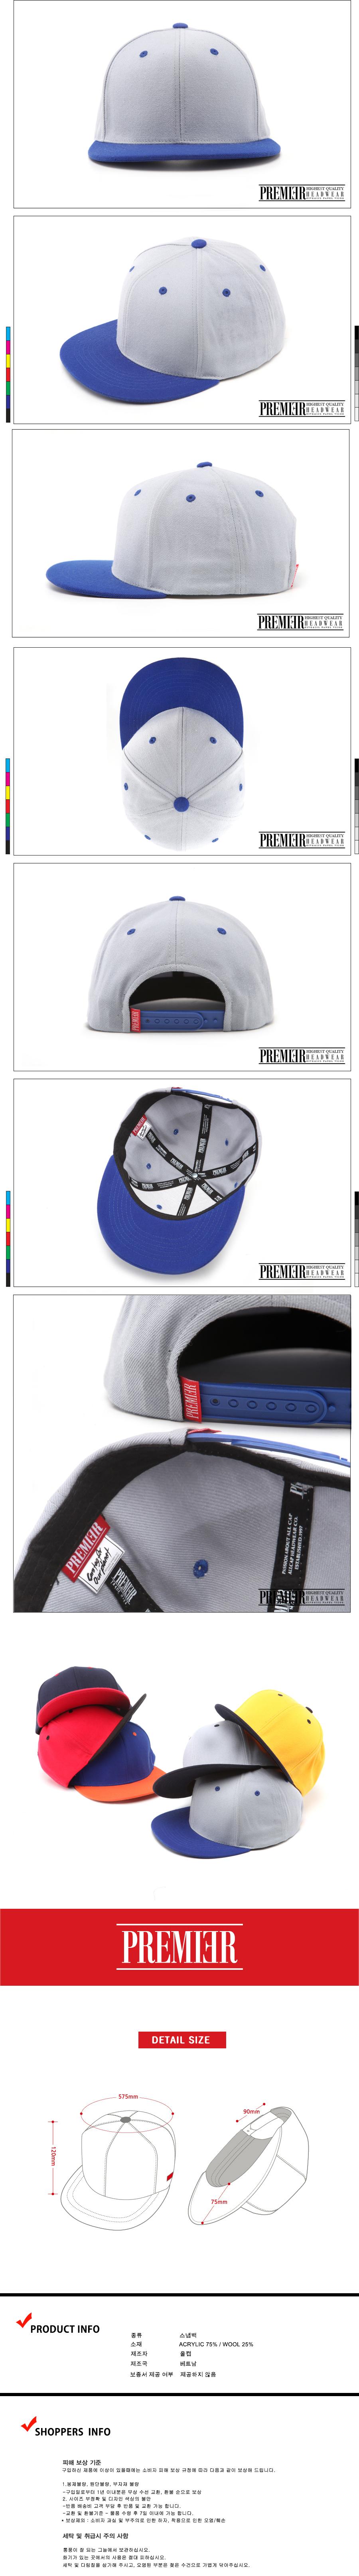 [ PREMIER ] [Premier] AW7525 One Color Custom Grey/Royal